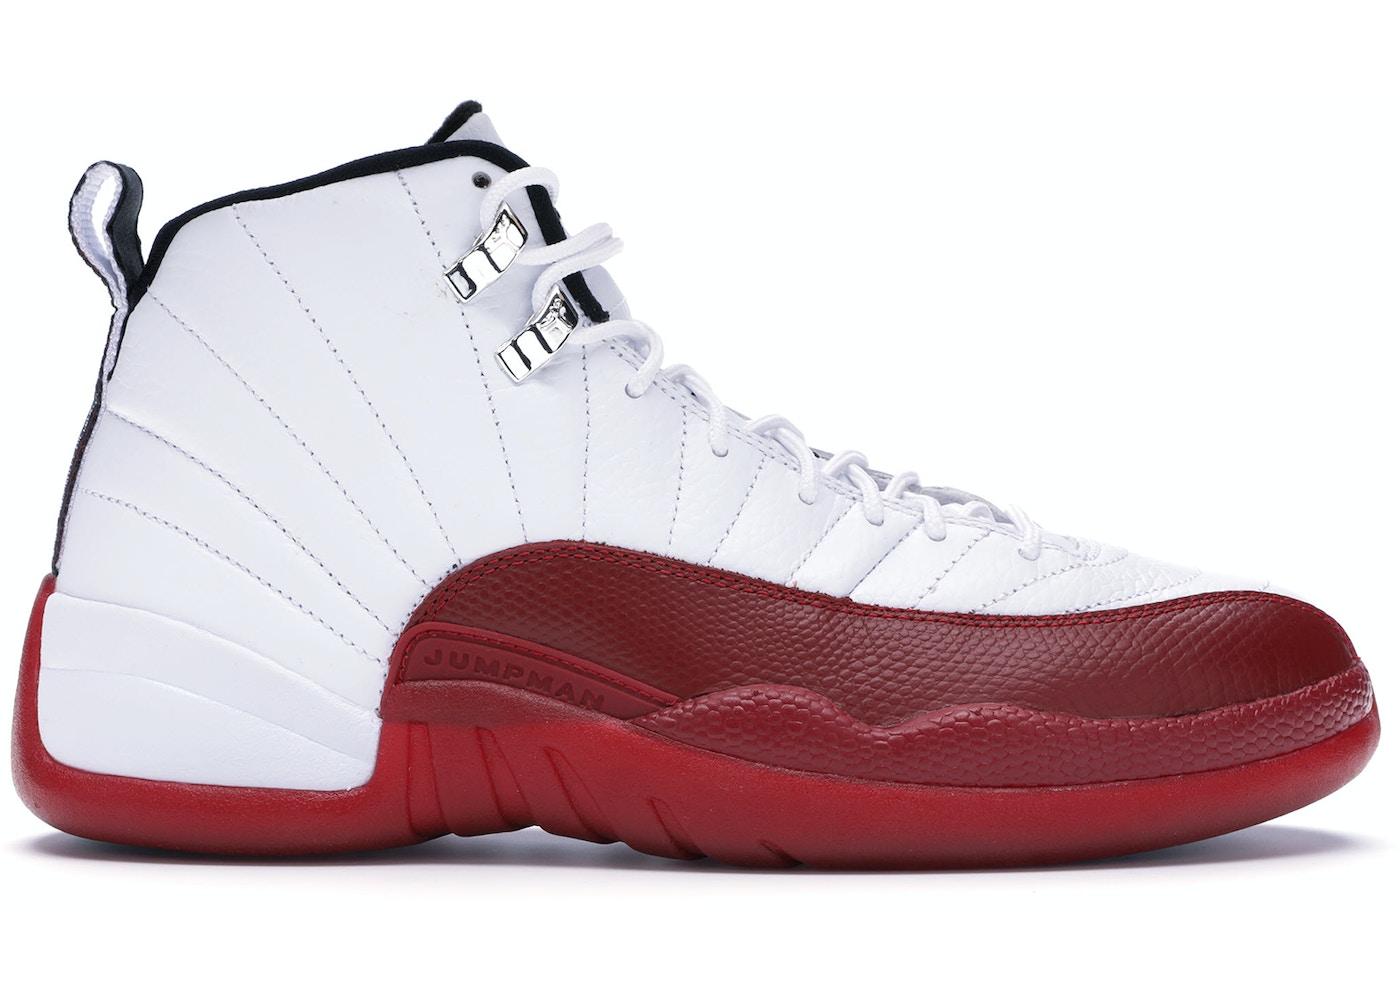 sports shoes 1a8c7 a62a6 Jordan 12 Retro Cherry (2009)